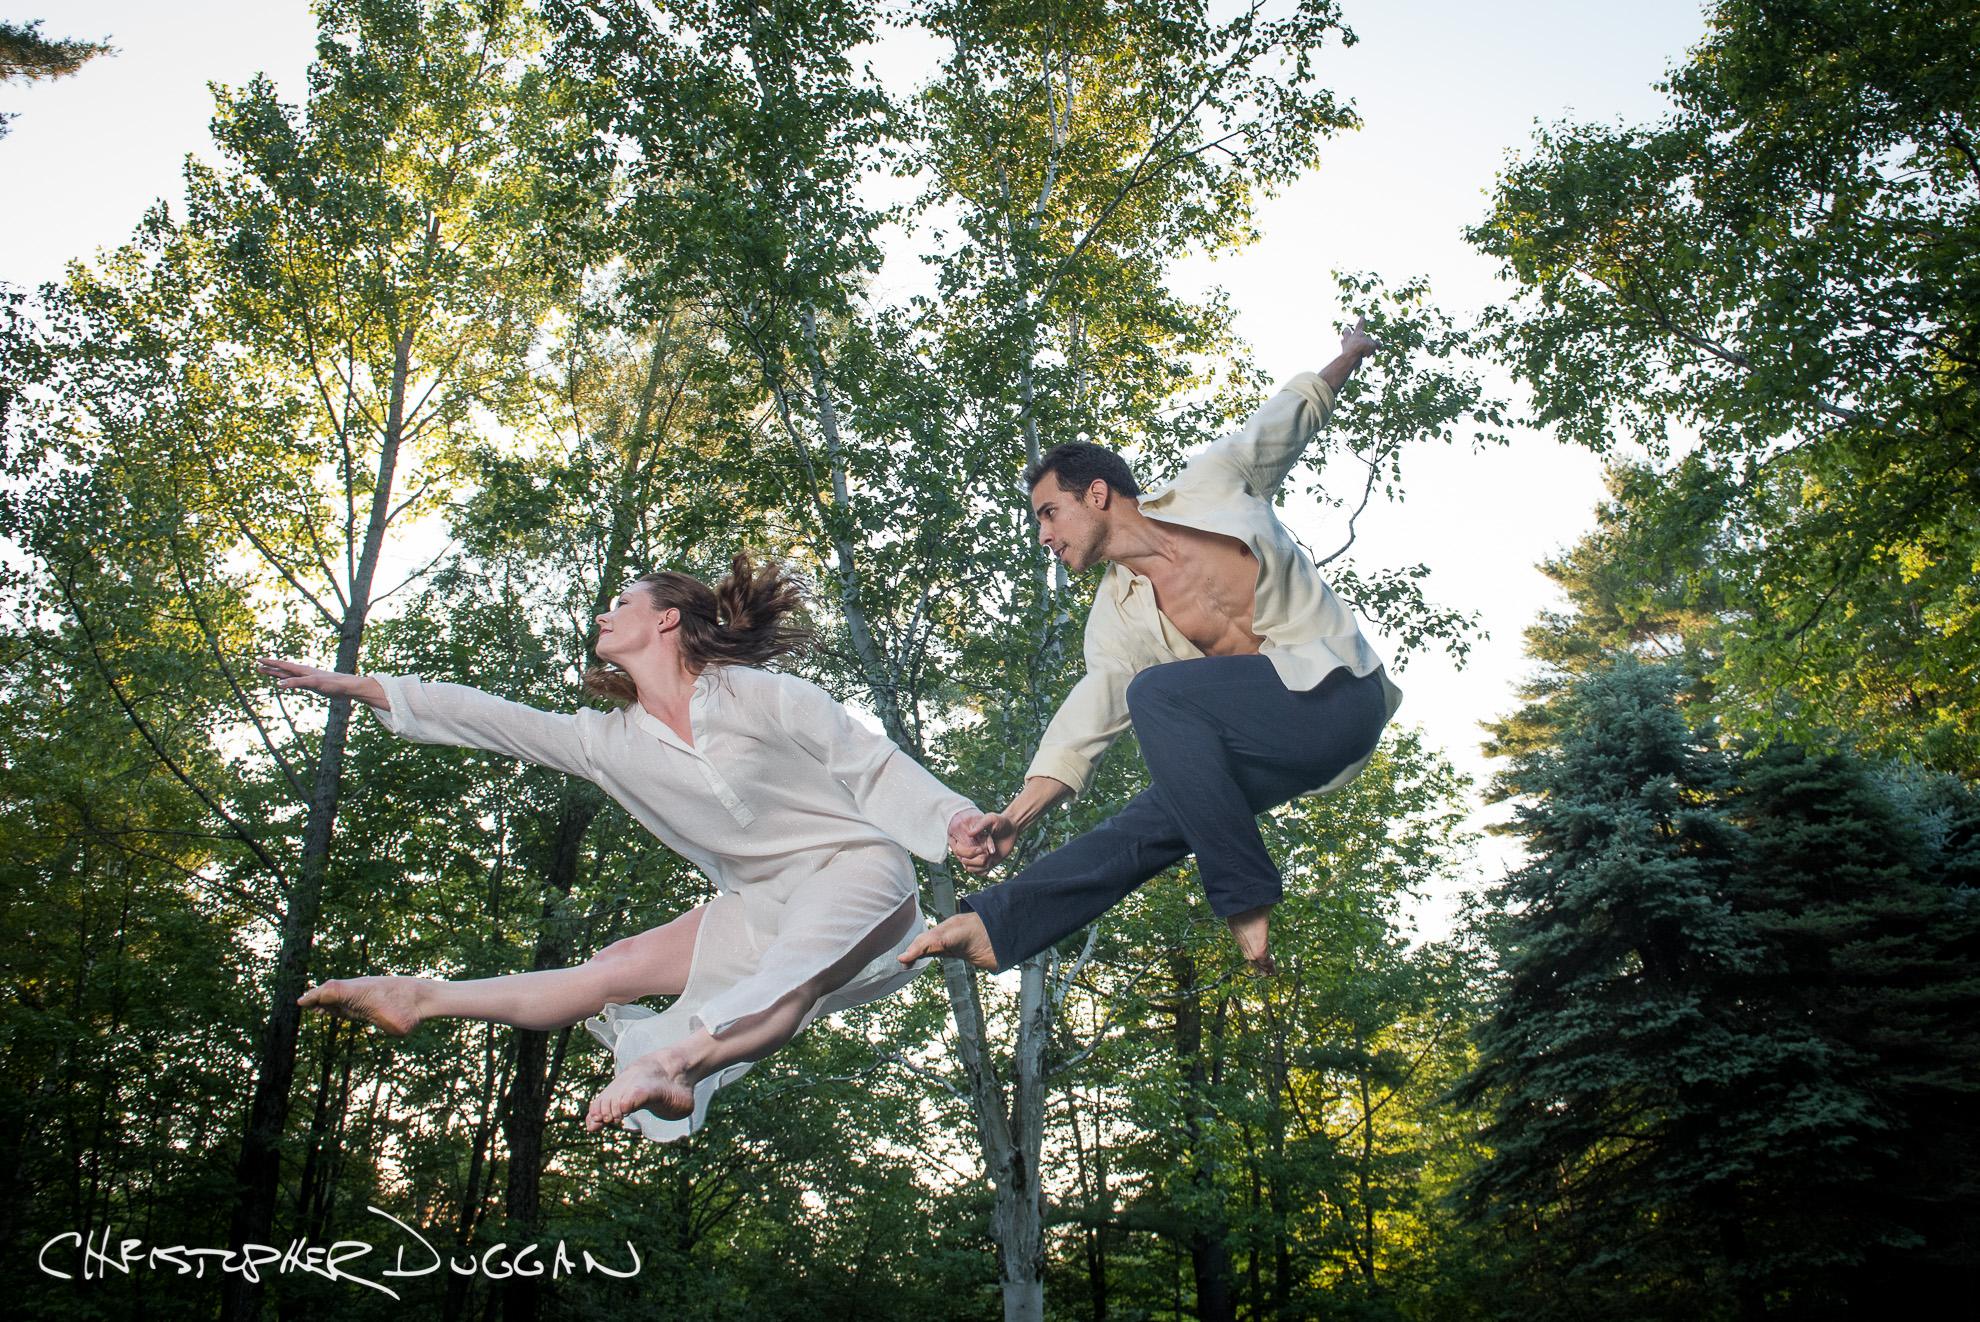 Paul Taylor Dance photos by Christopher Duggan Photography